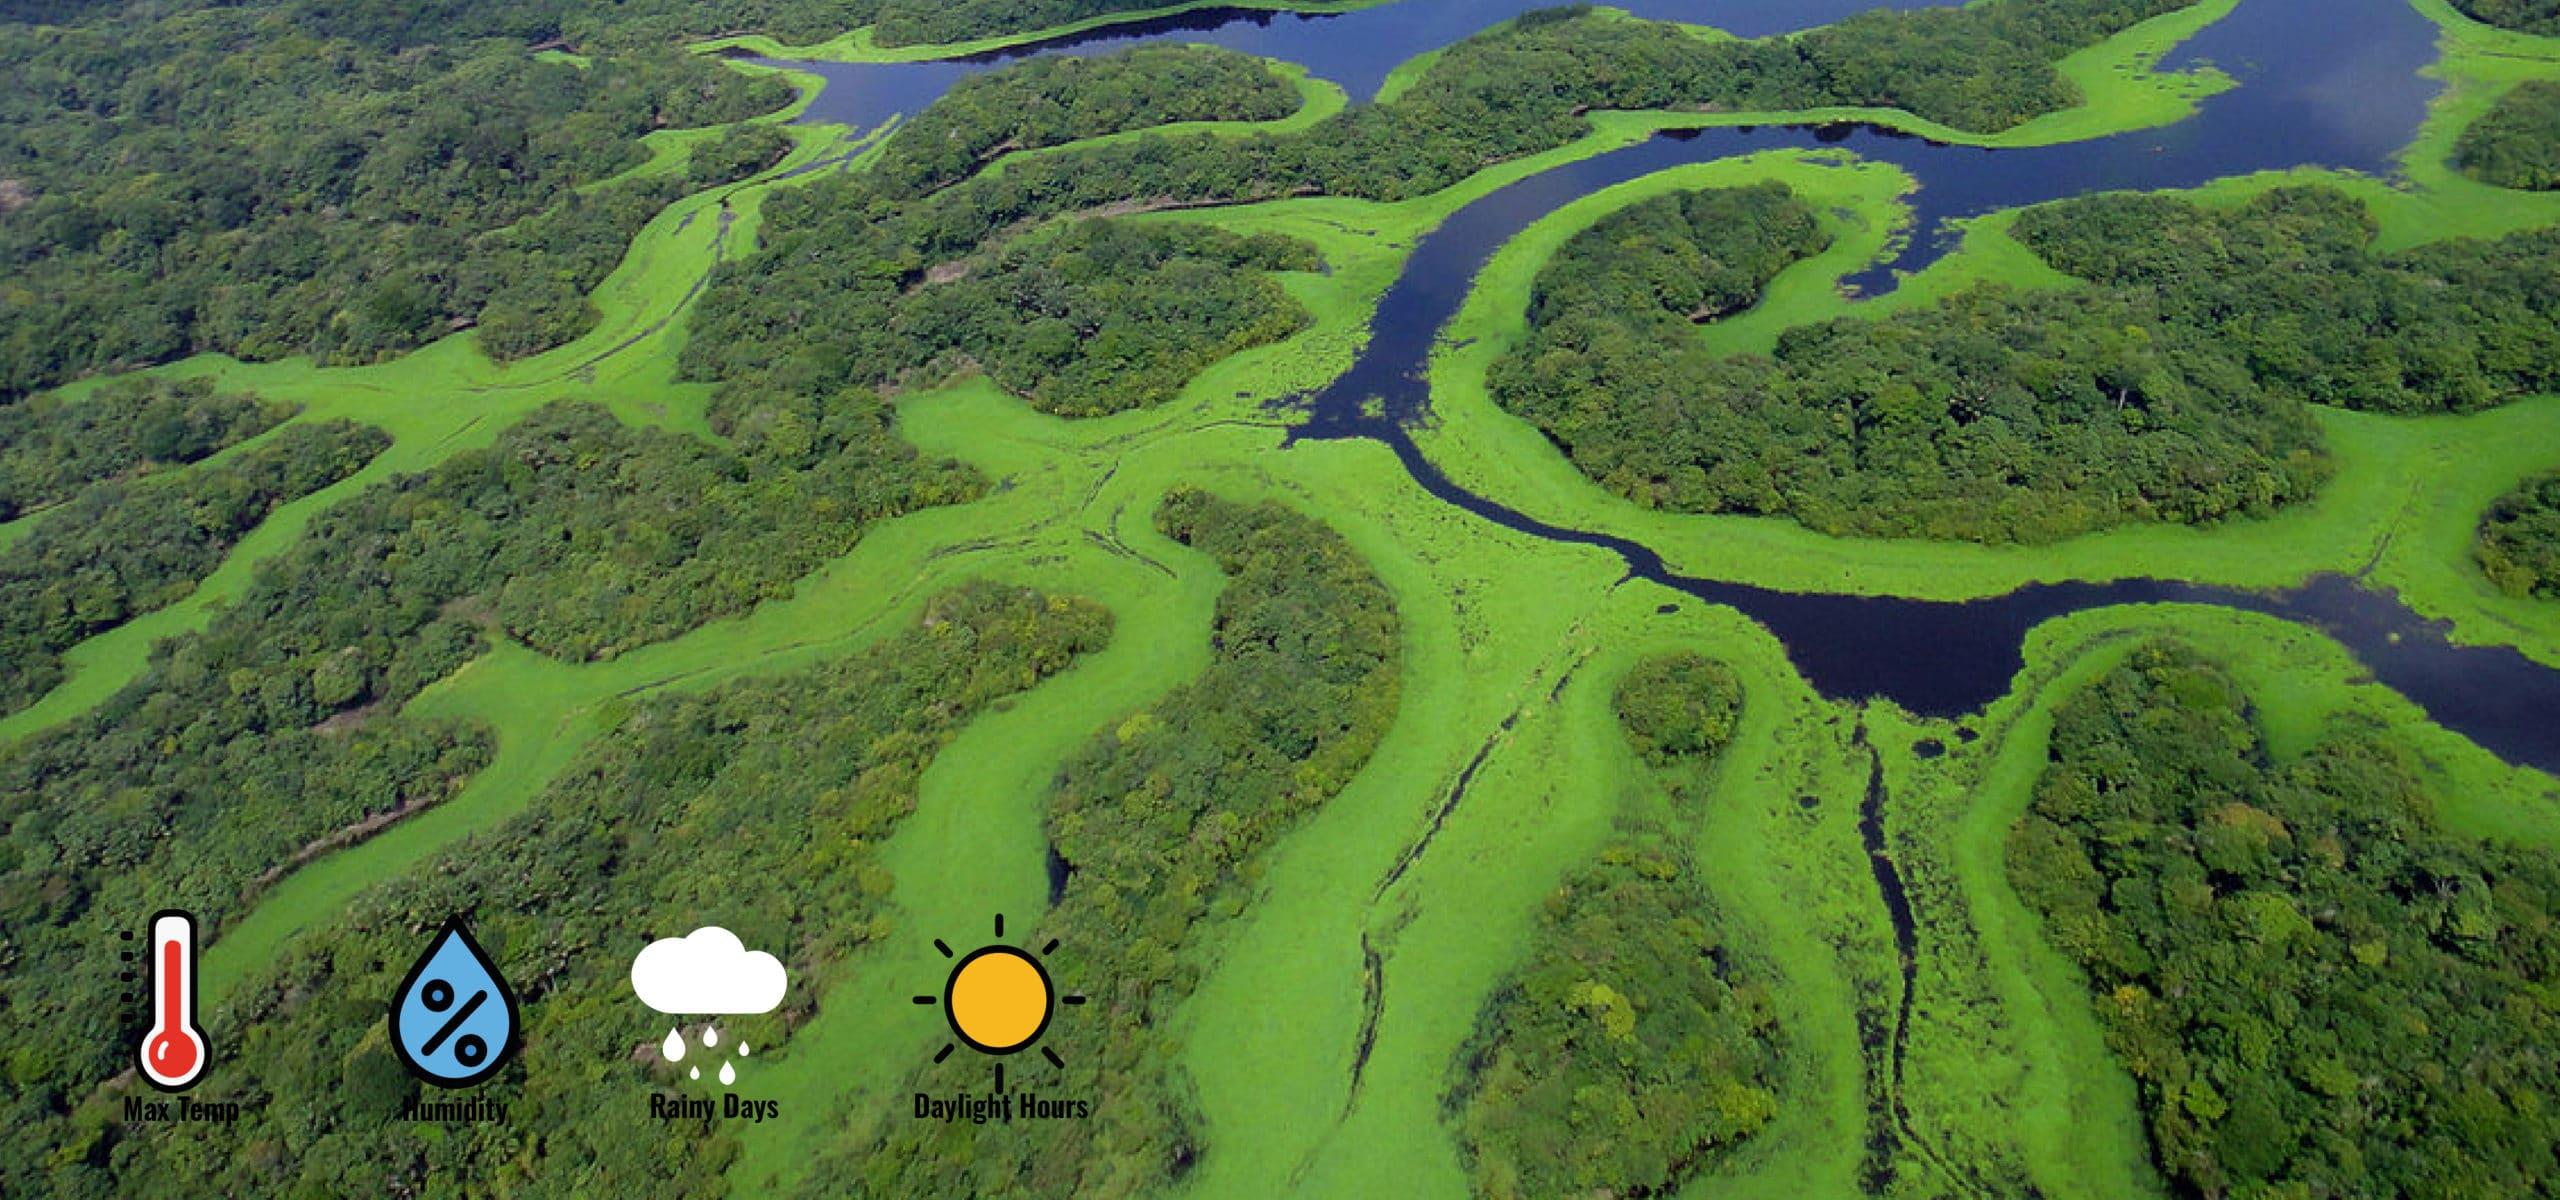 Weather in Manaos, Amazonas. RipioTurismo Incoming Tour Operator Brazil